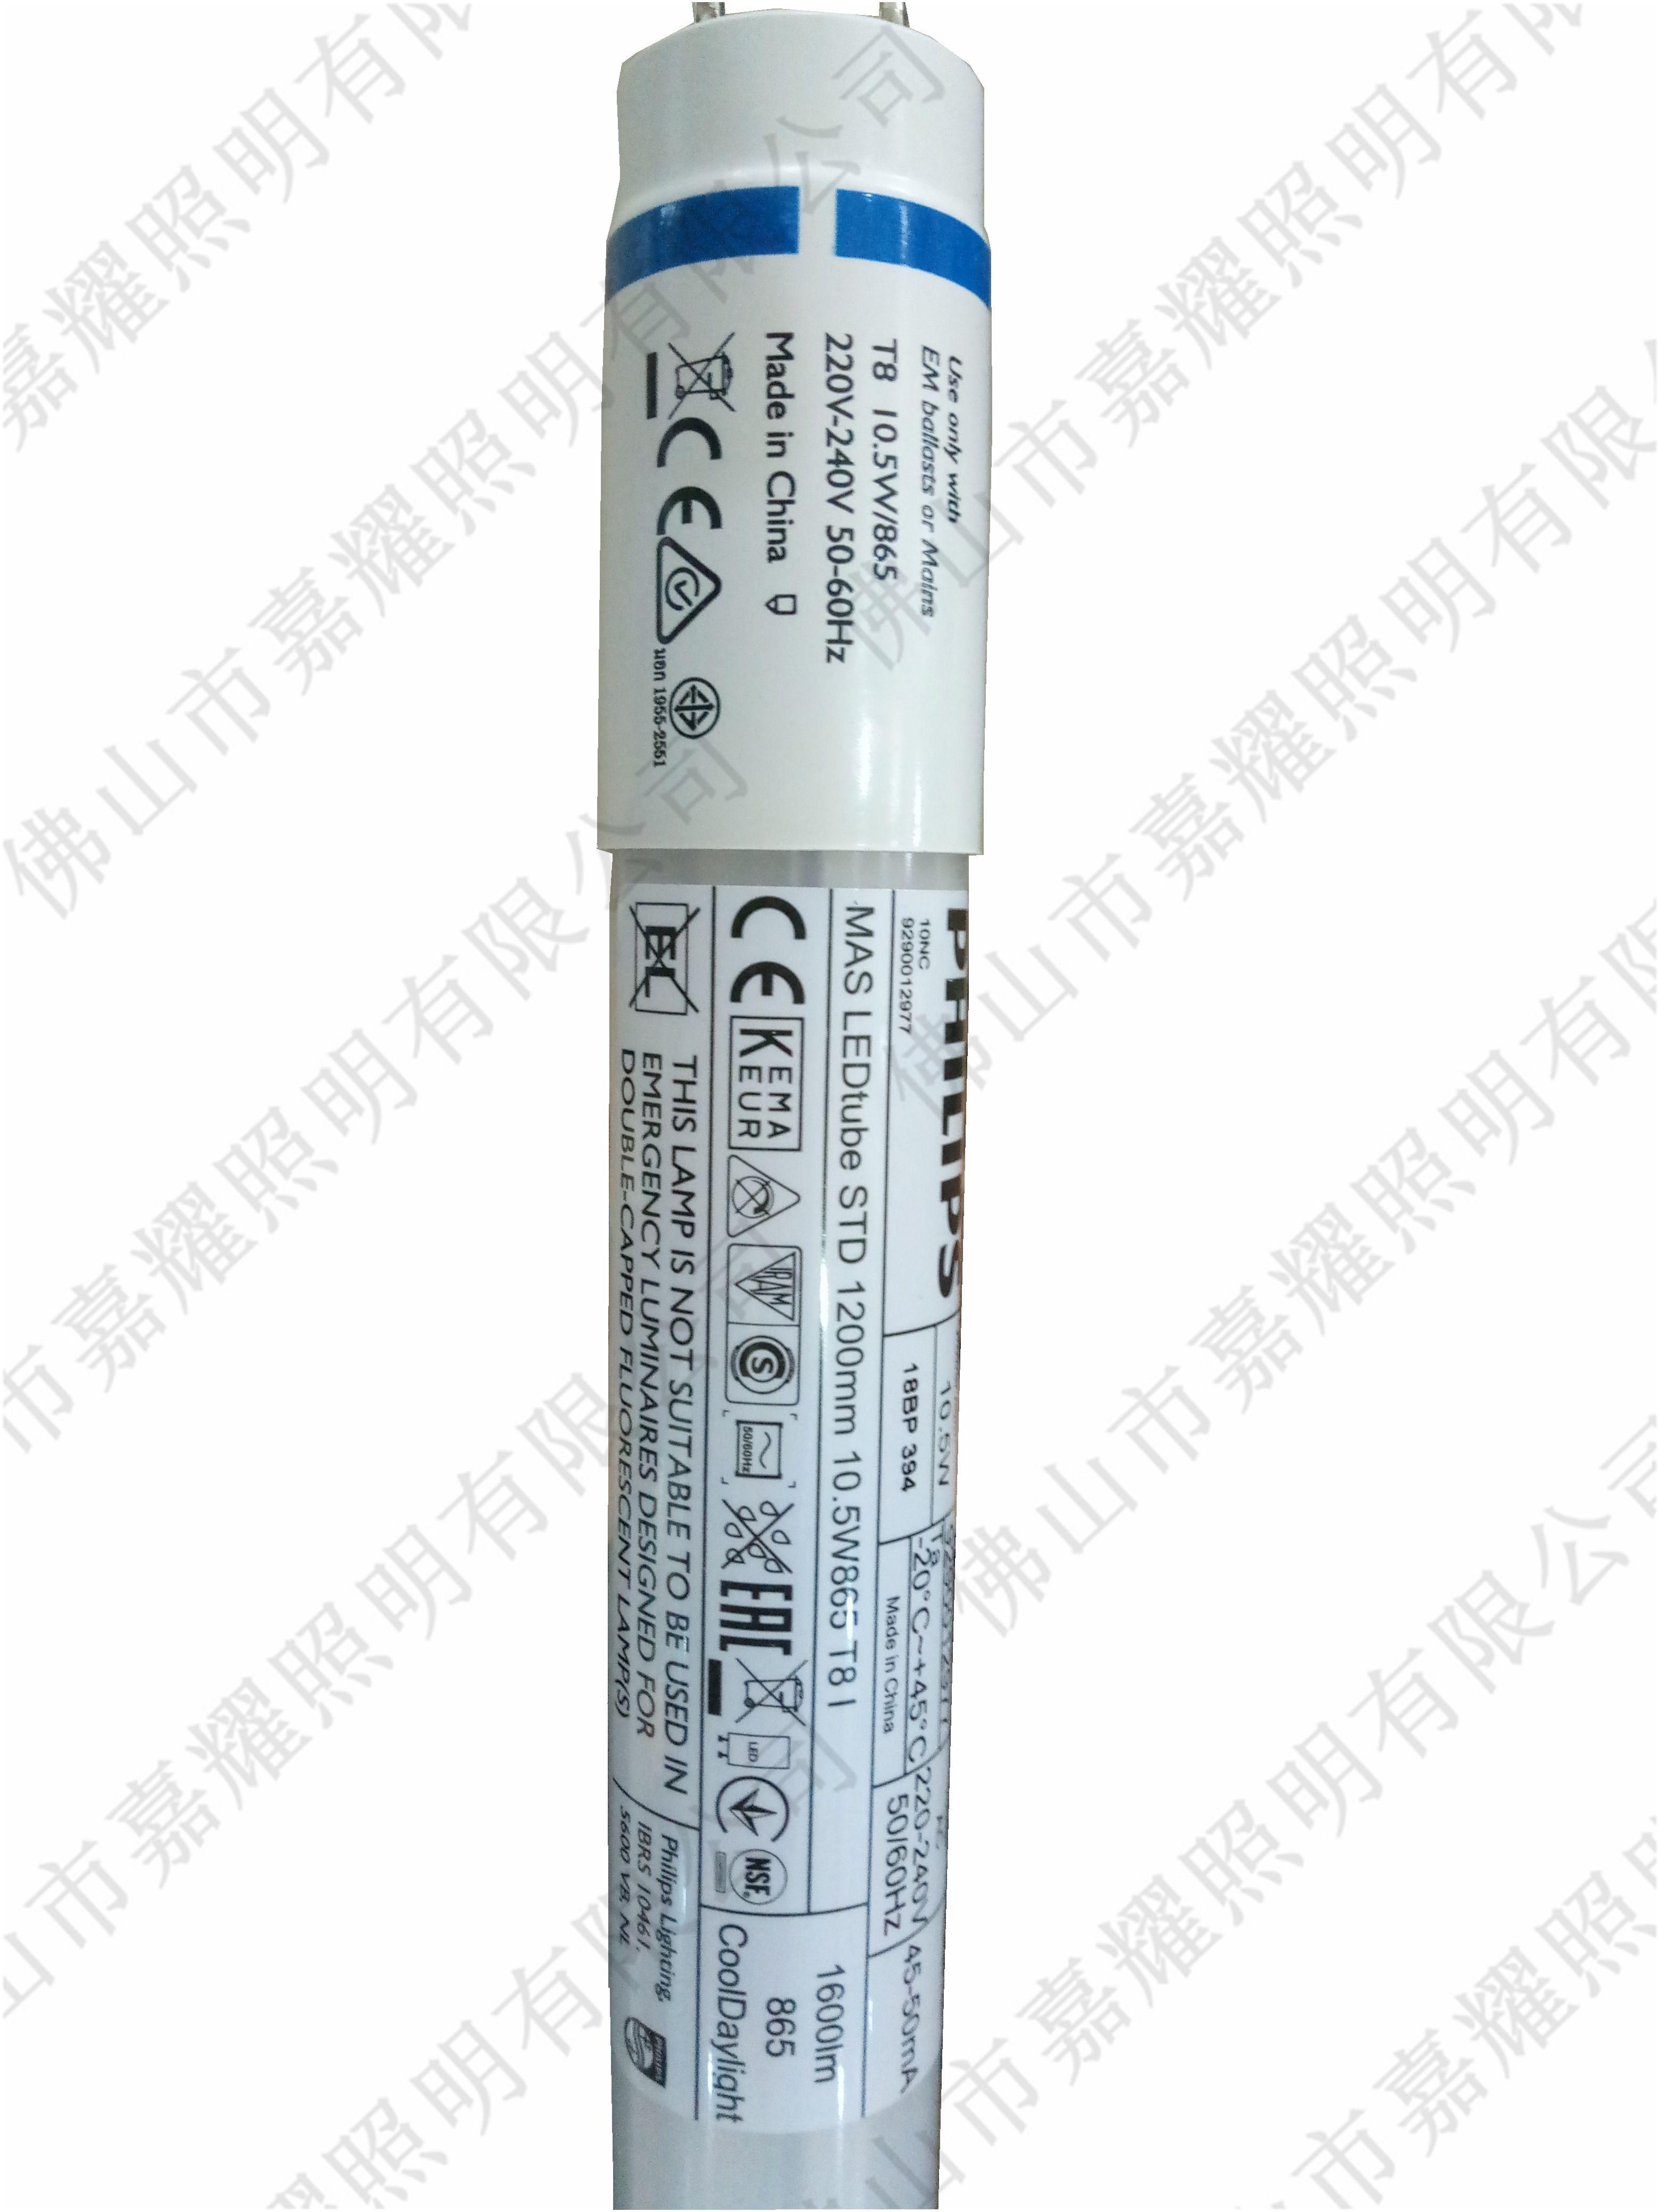 飞利浦学校LED灯管MAS LEDtube 600mm HO 8W/865 T8多少钱